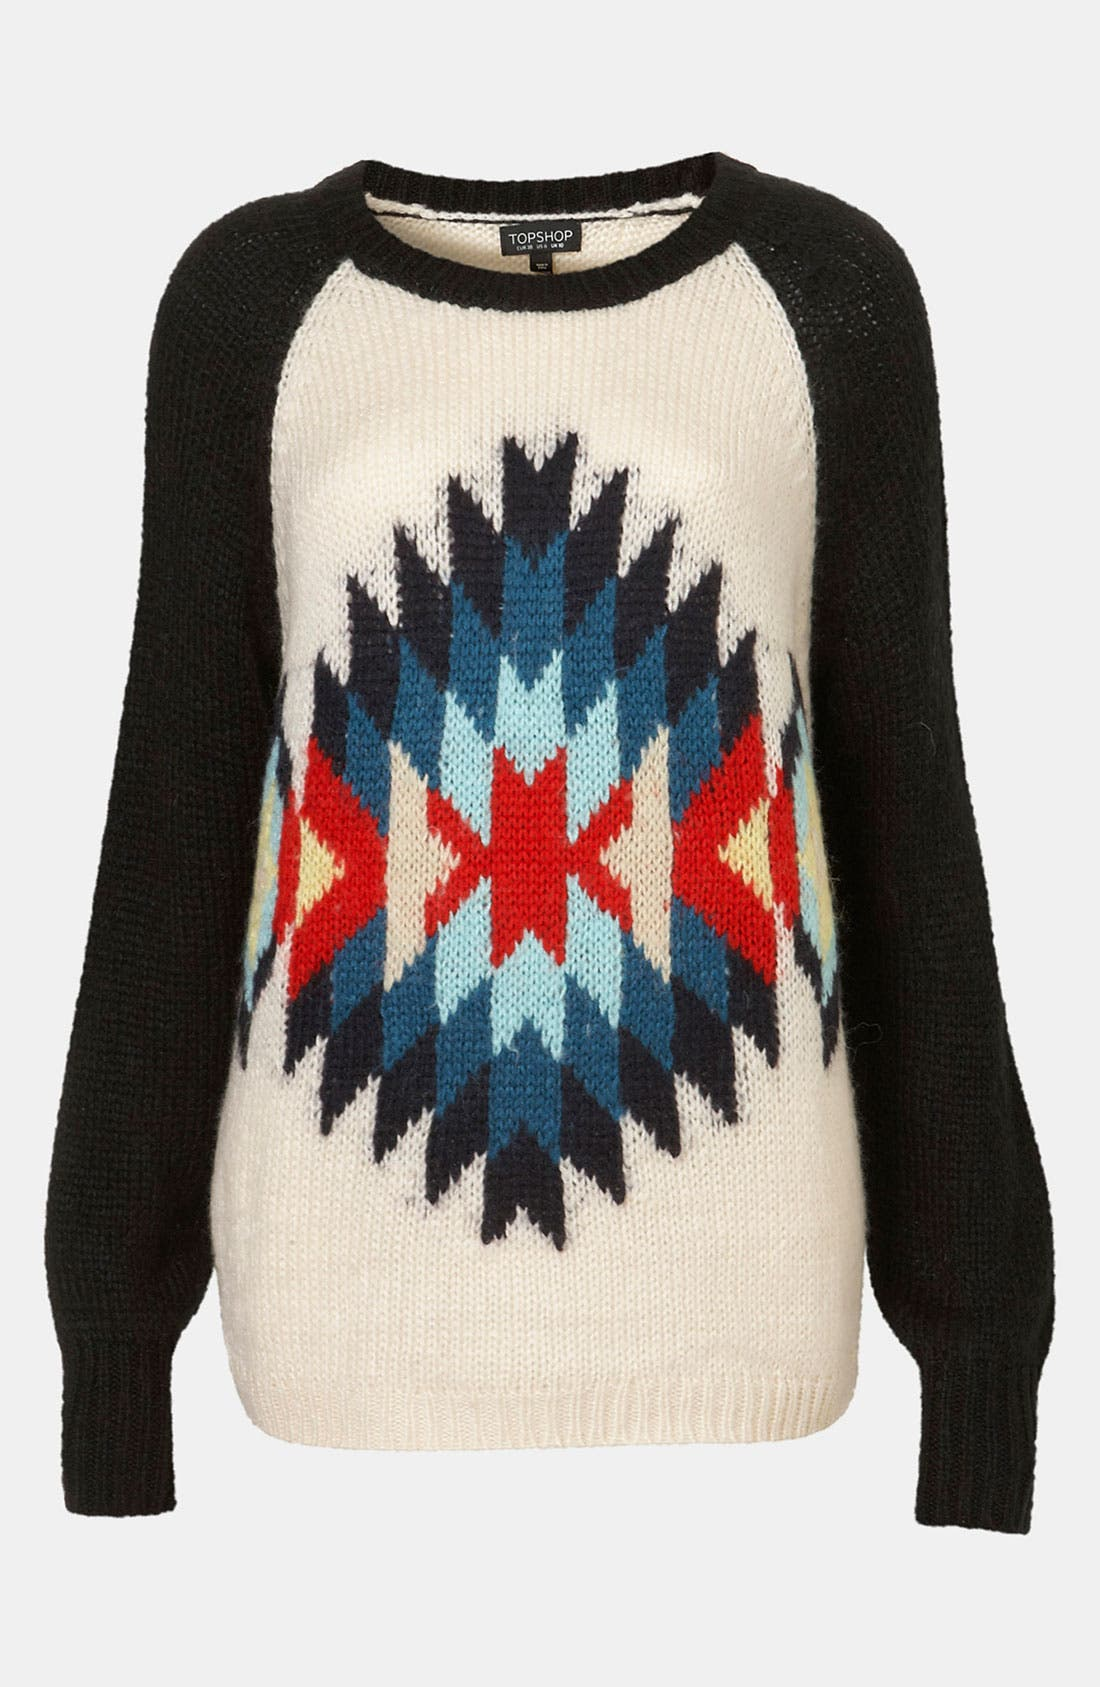 TOPSHOP 'Eye Dazzler' Sweater, Main, color, 901